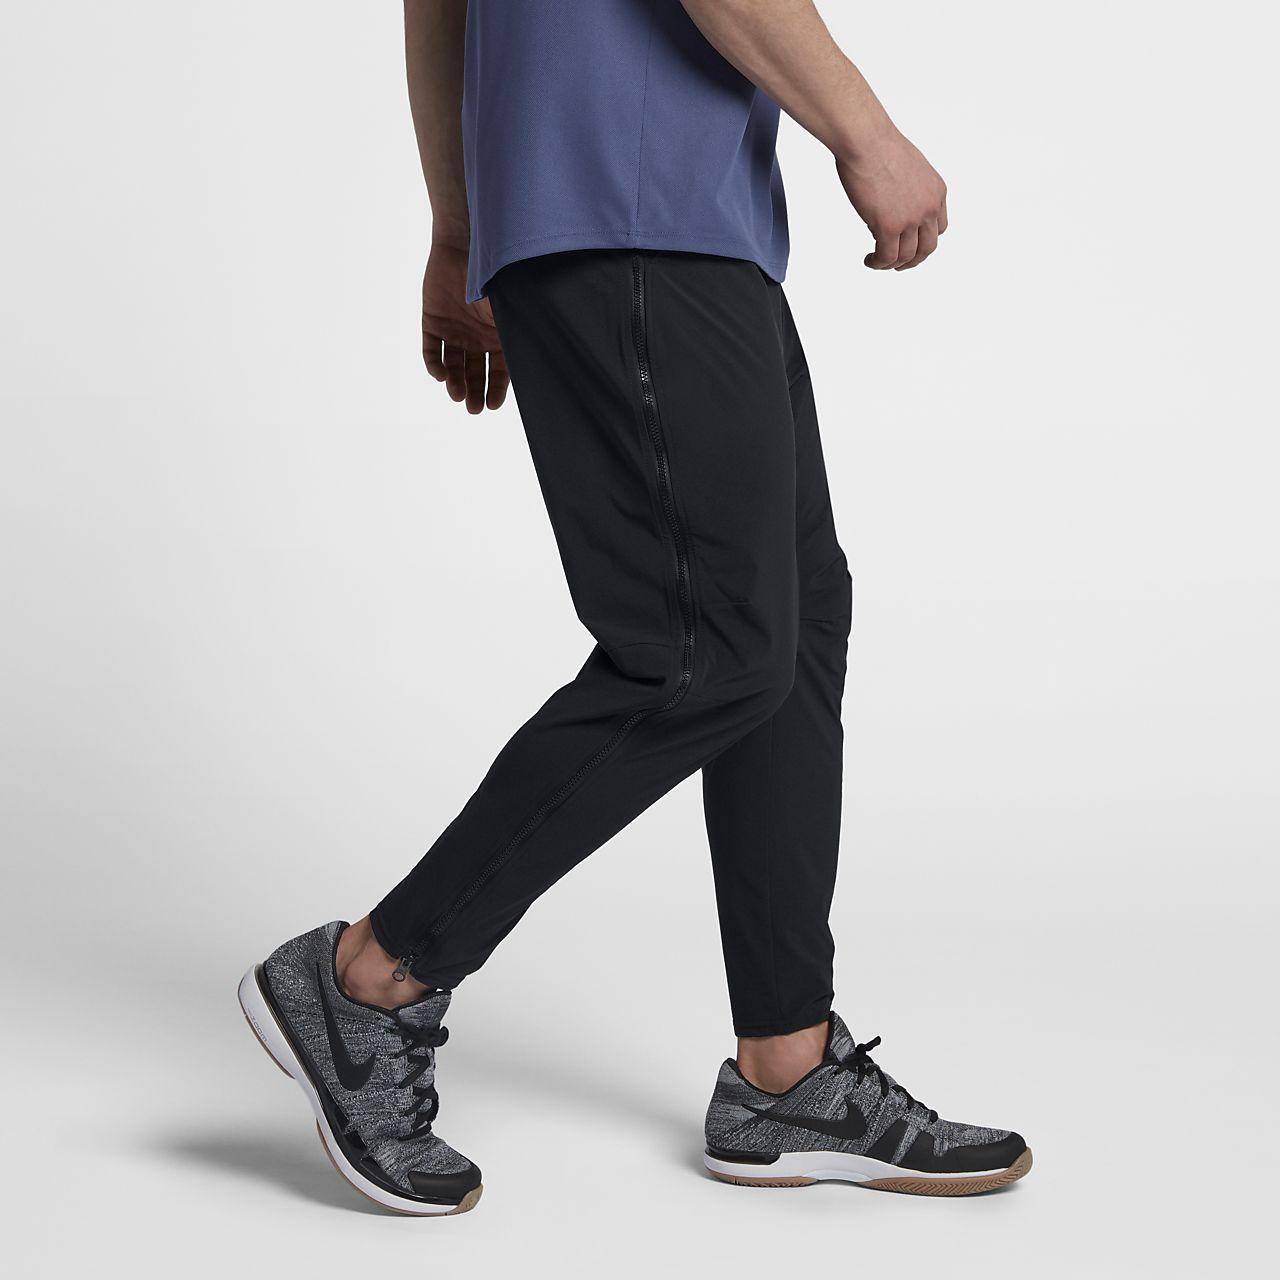 NikeCourt Flex Men's Tennis Trousers